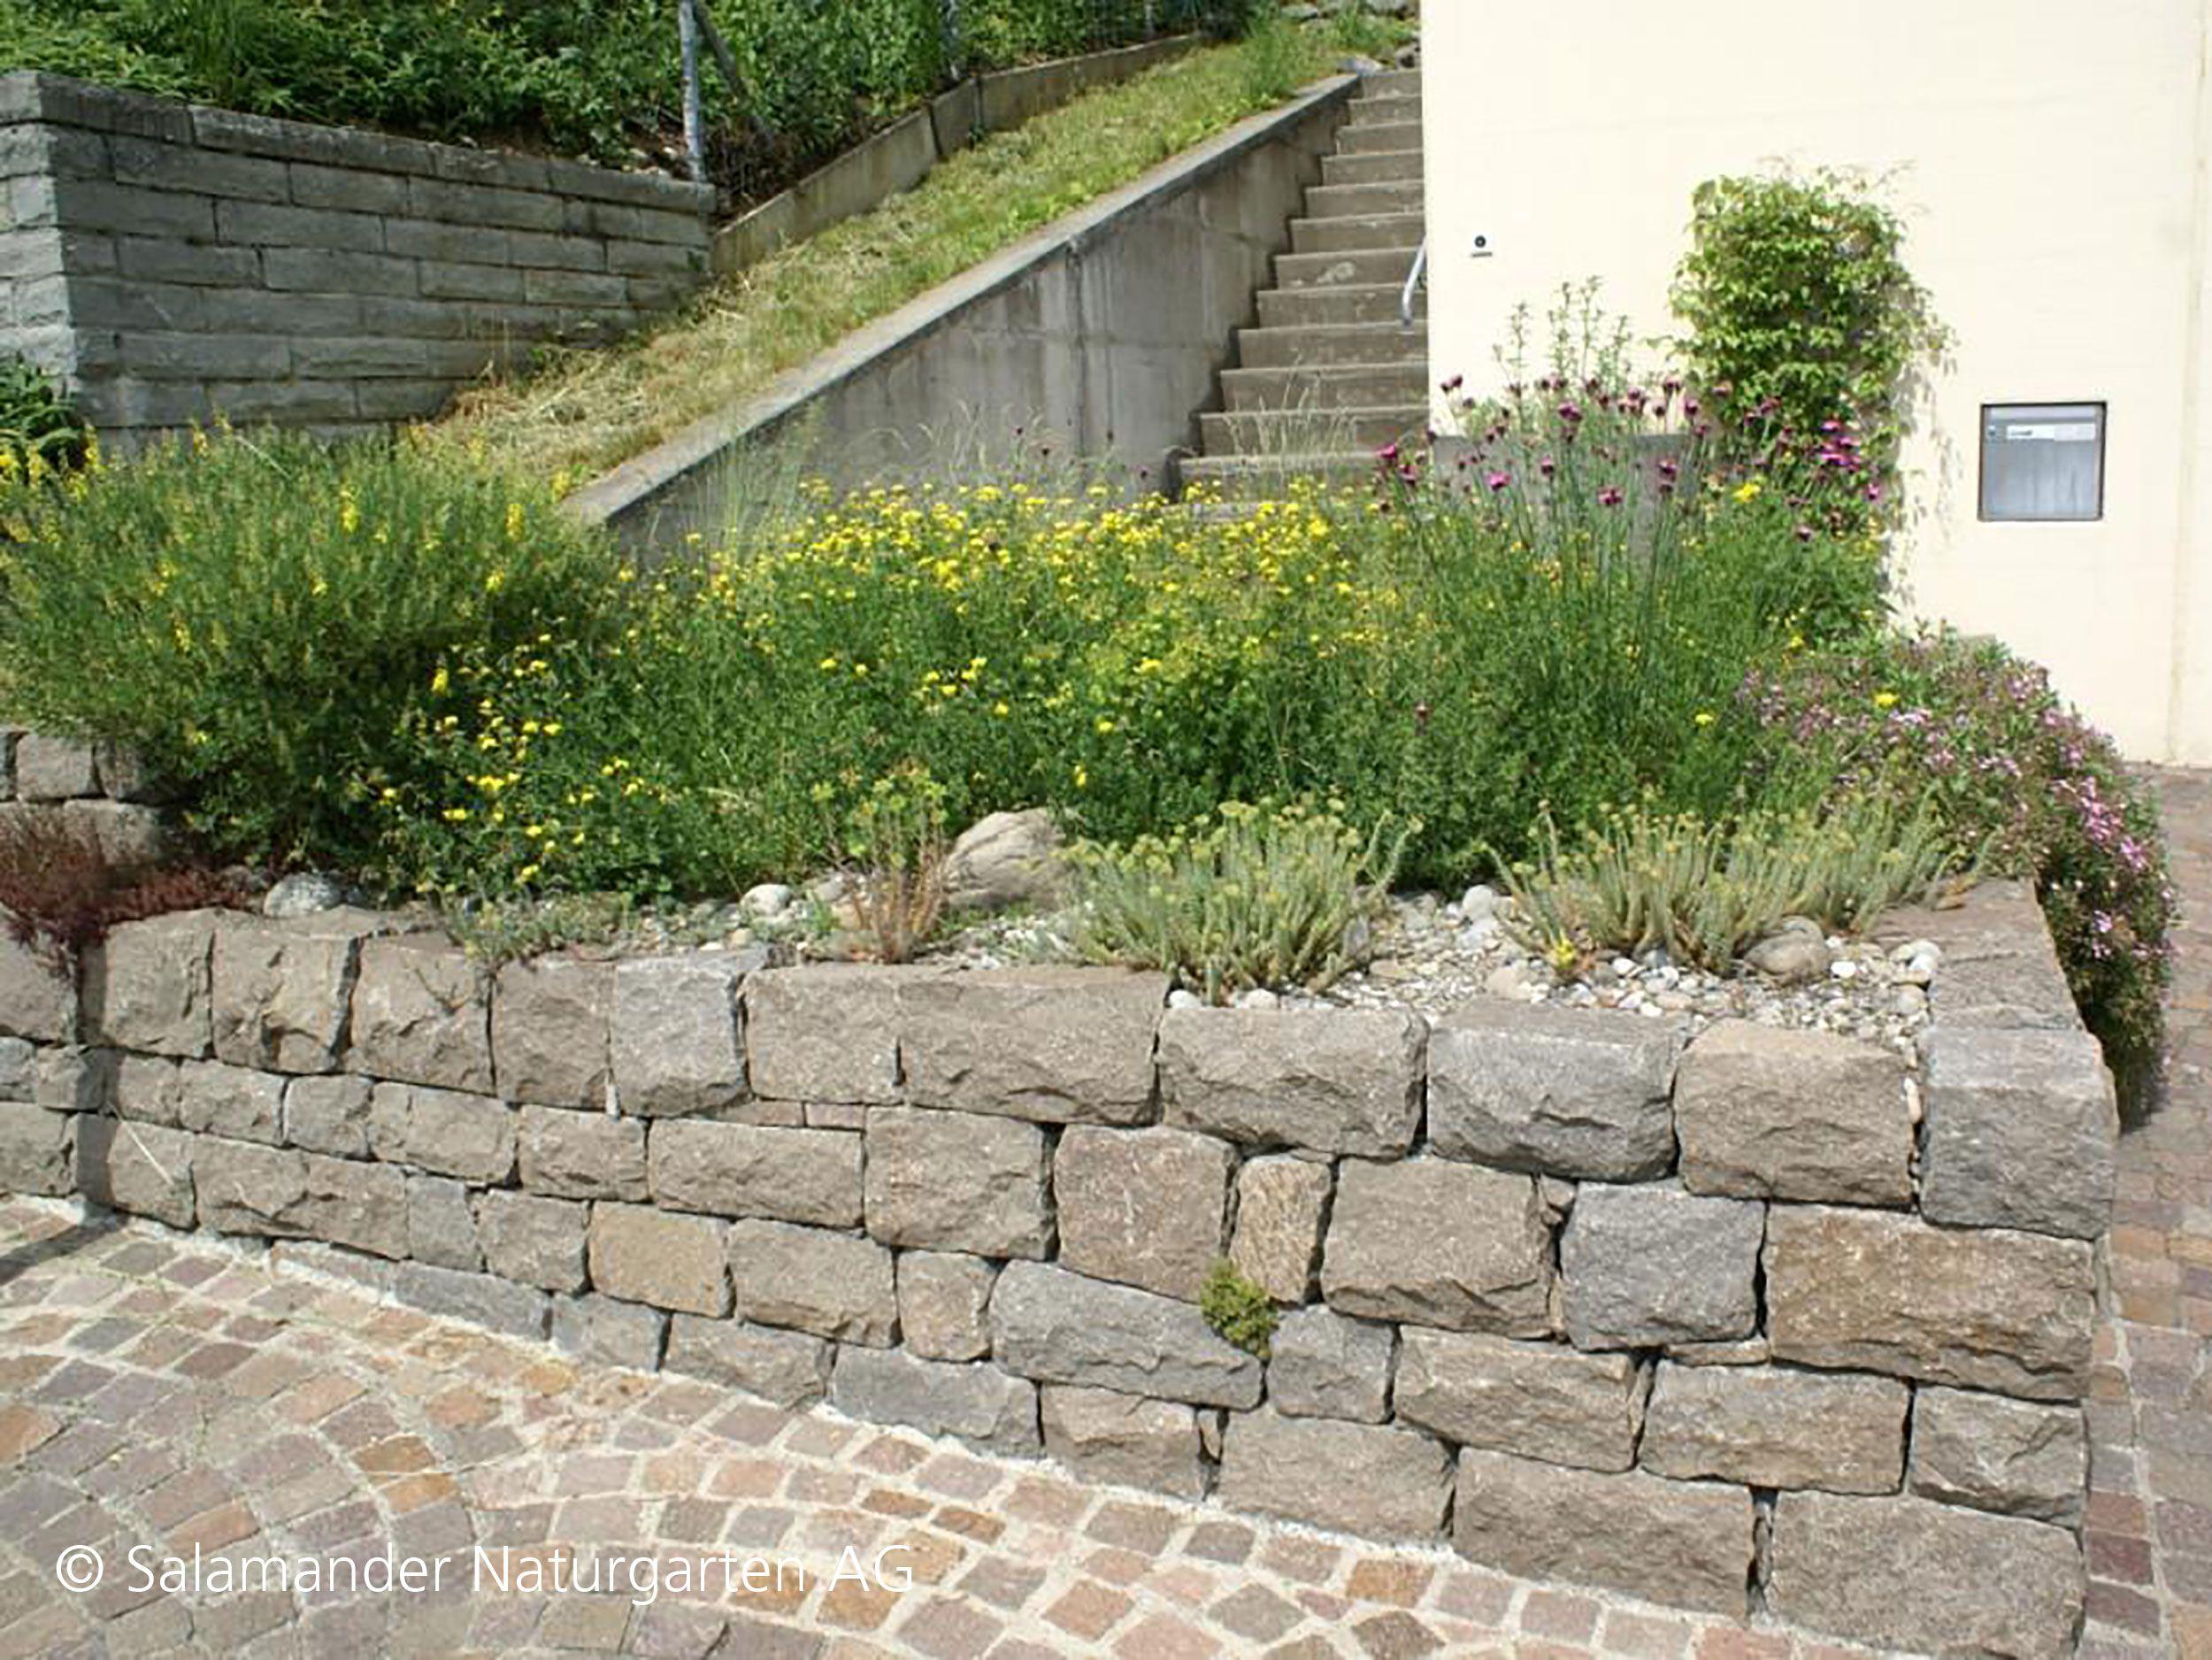 Italienischer Porphyr Lagerverband Fugenklasse Ii Trockenmauer Drystonewall Trockenmauer Vorgarten Naturgarten